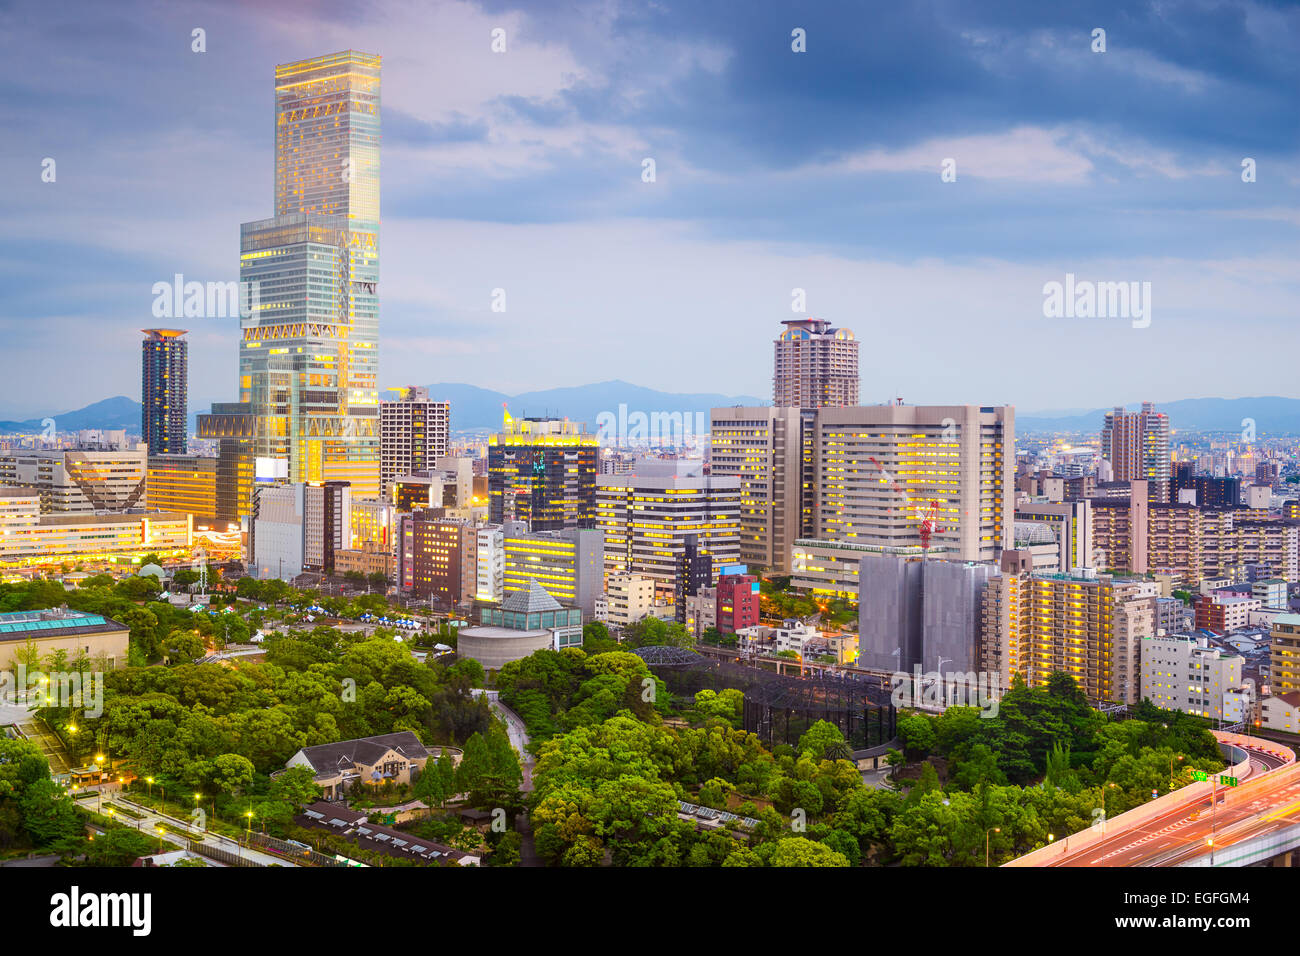 Osaka, Japon paysage urbain dans le district Abeno. Photo Stock